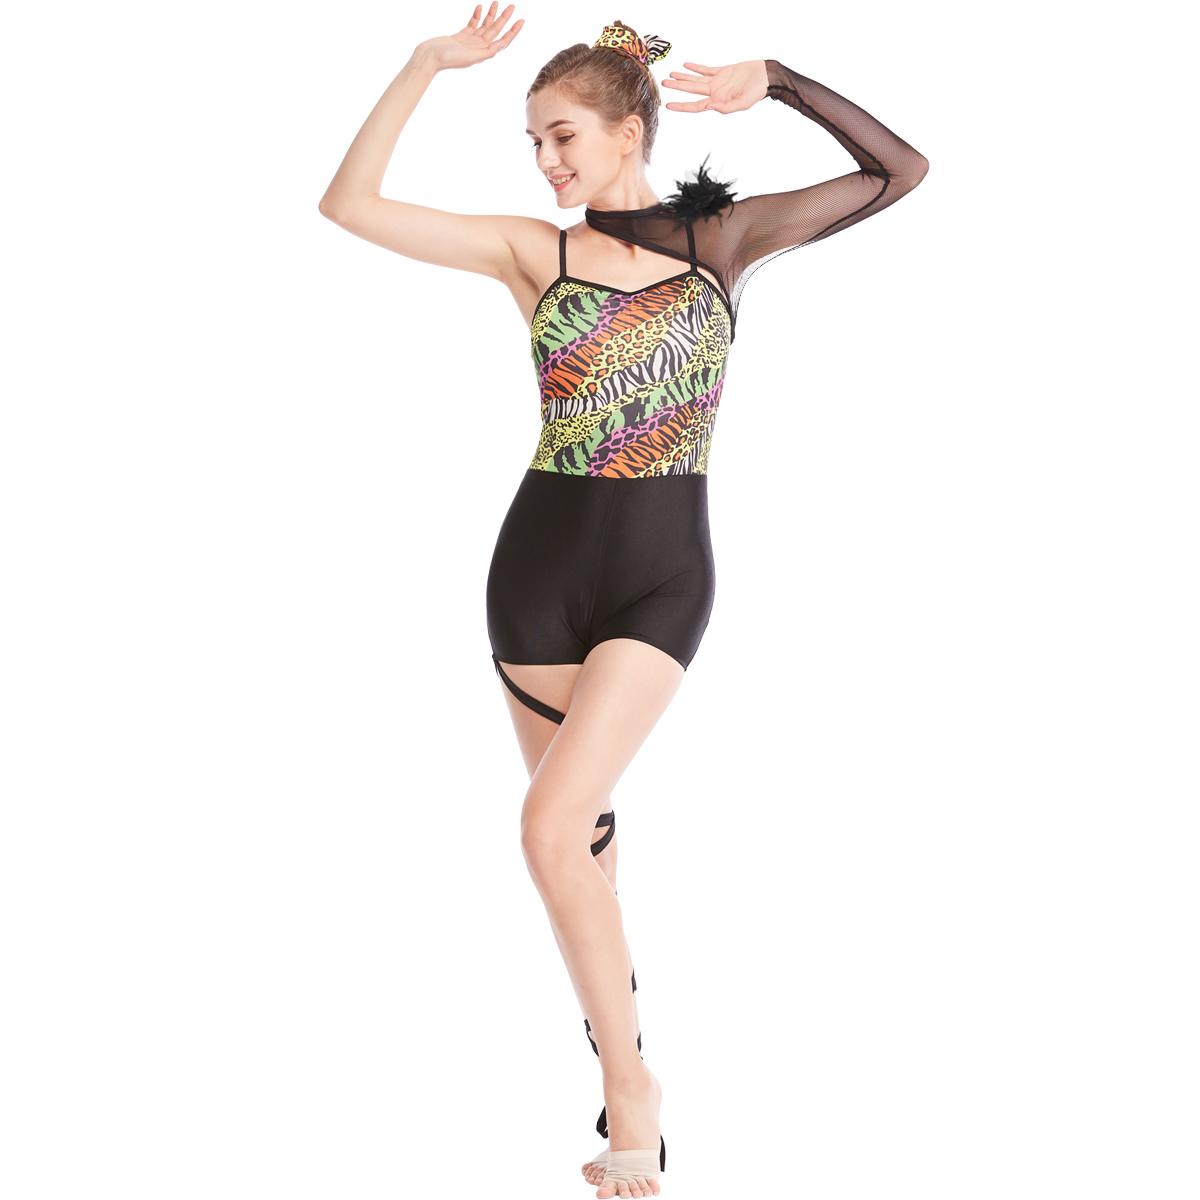 MIDEE professional dress dance costumes jazz manufacturer dancer-2